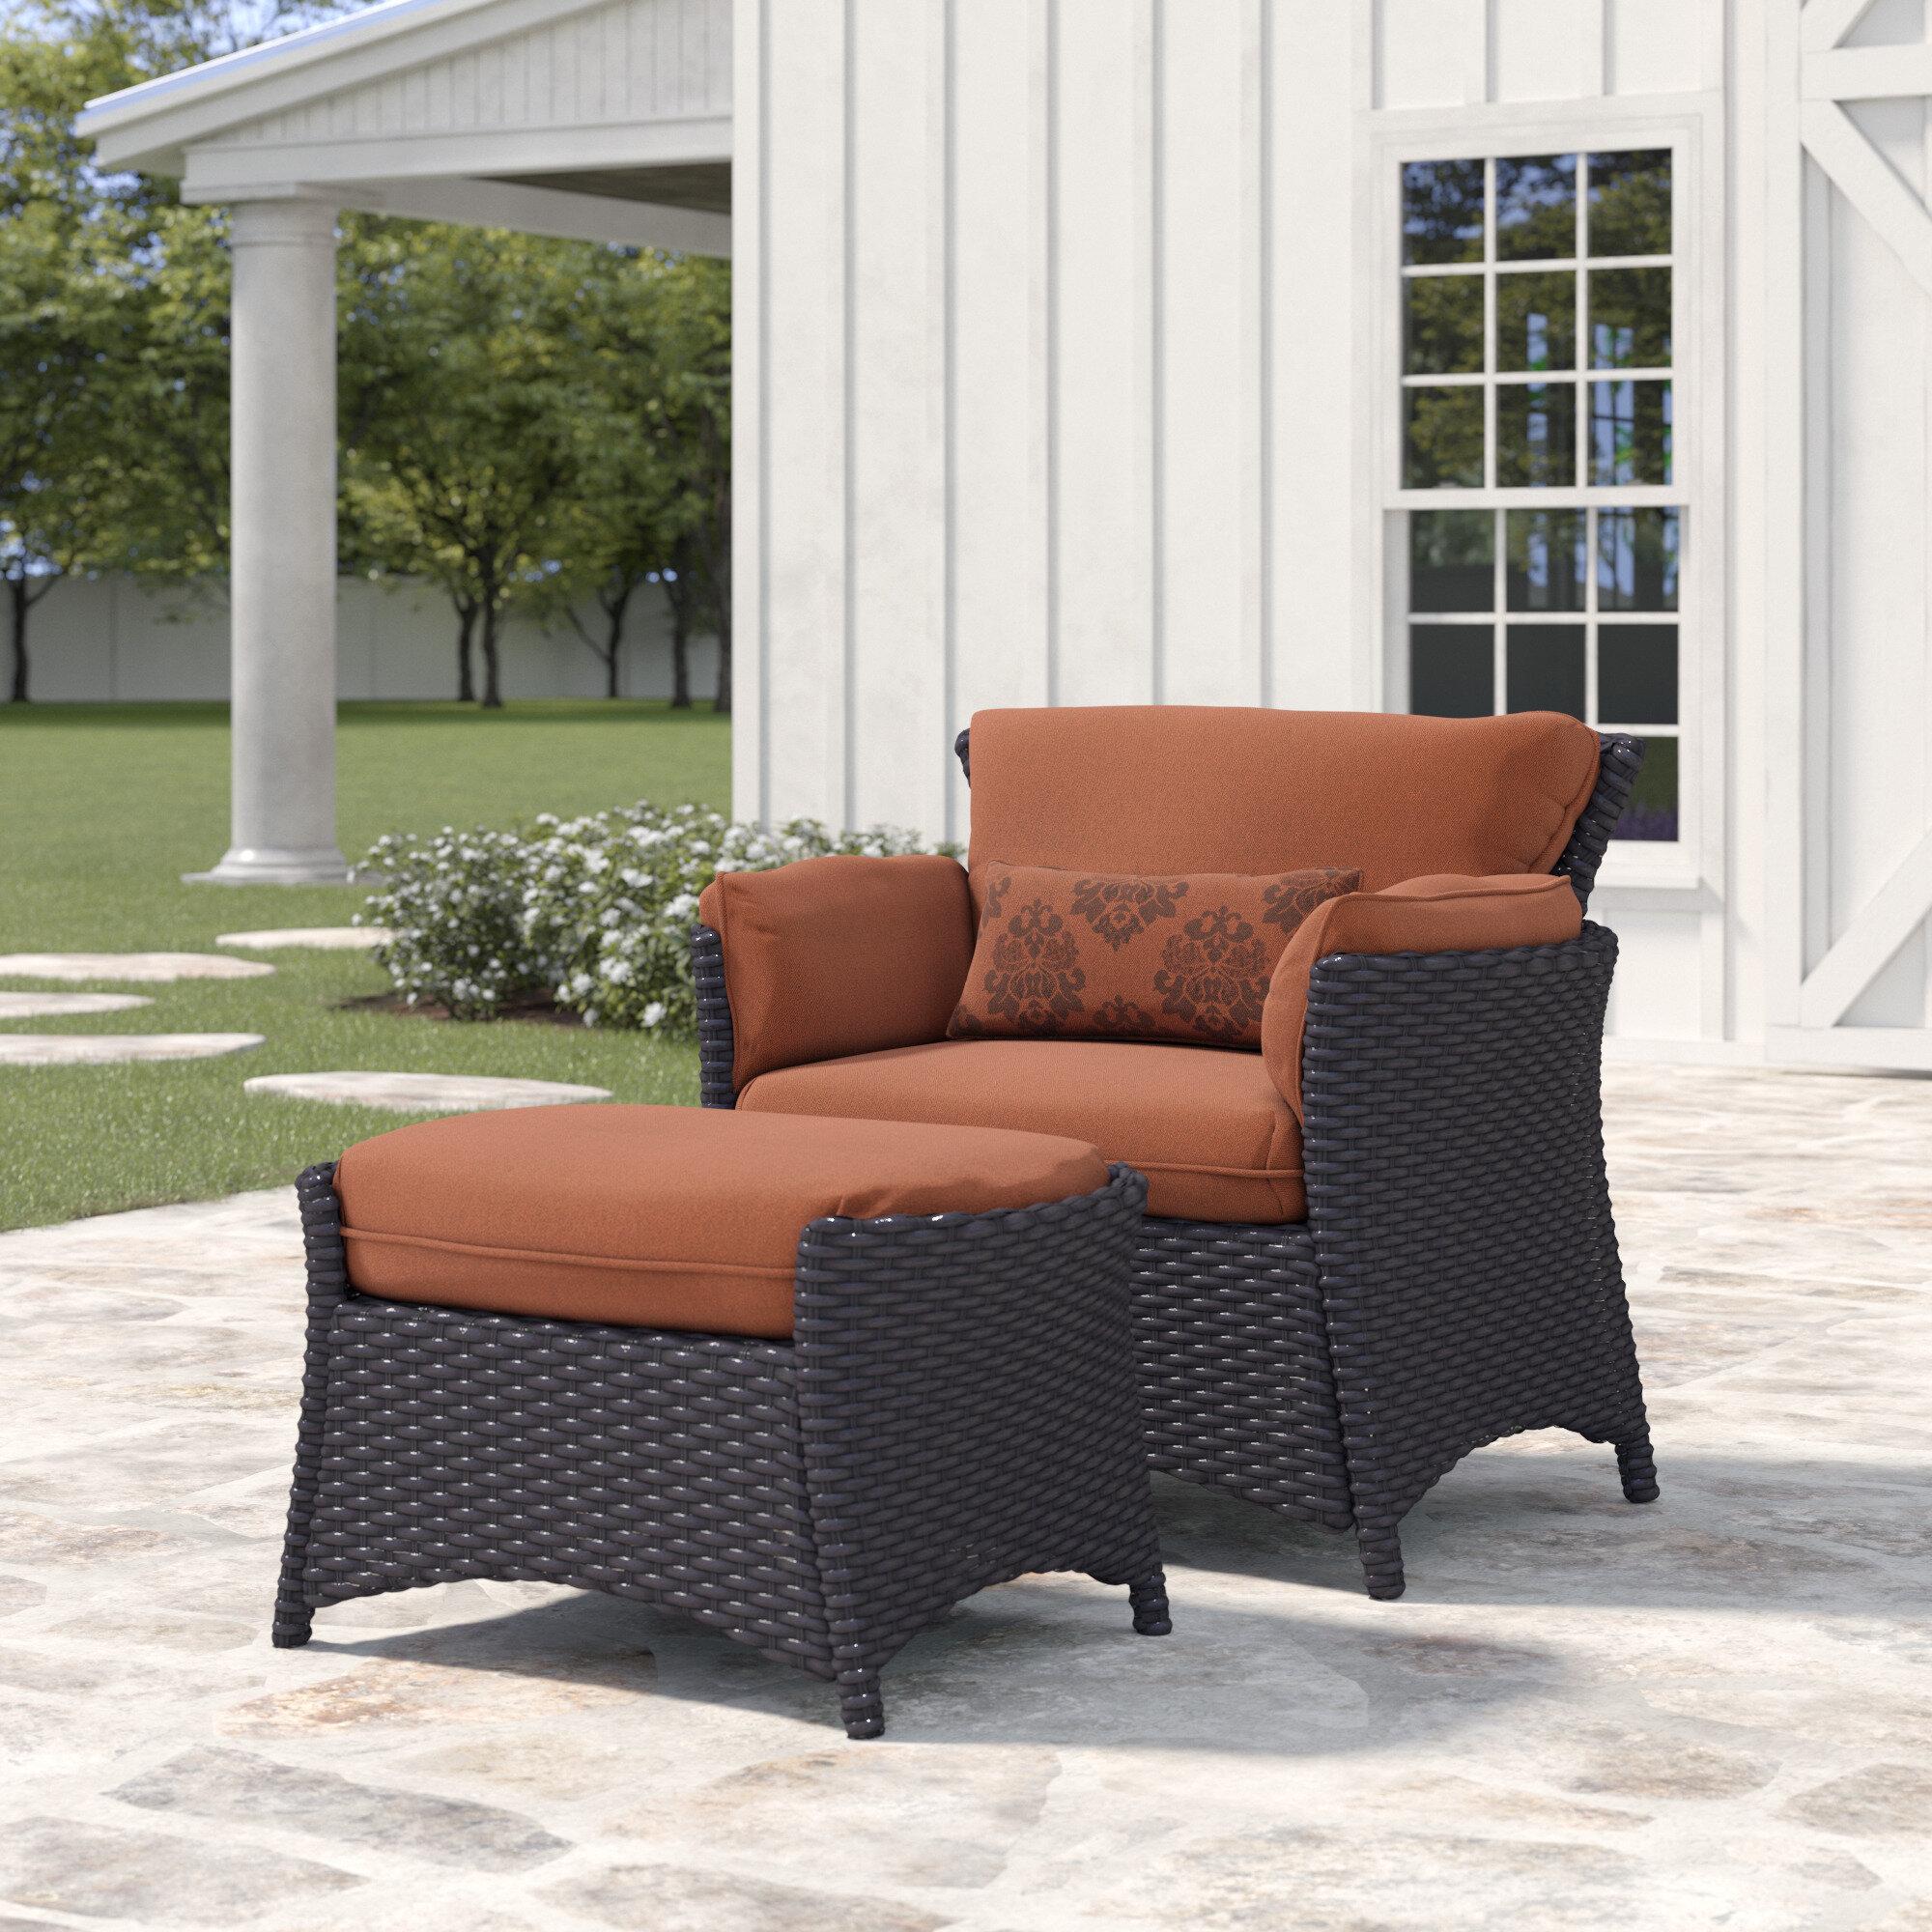 2 Piece Deep Seating Patio Chair